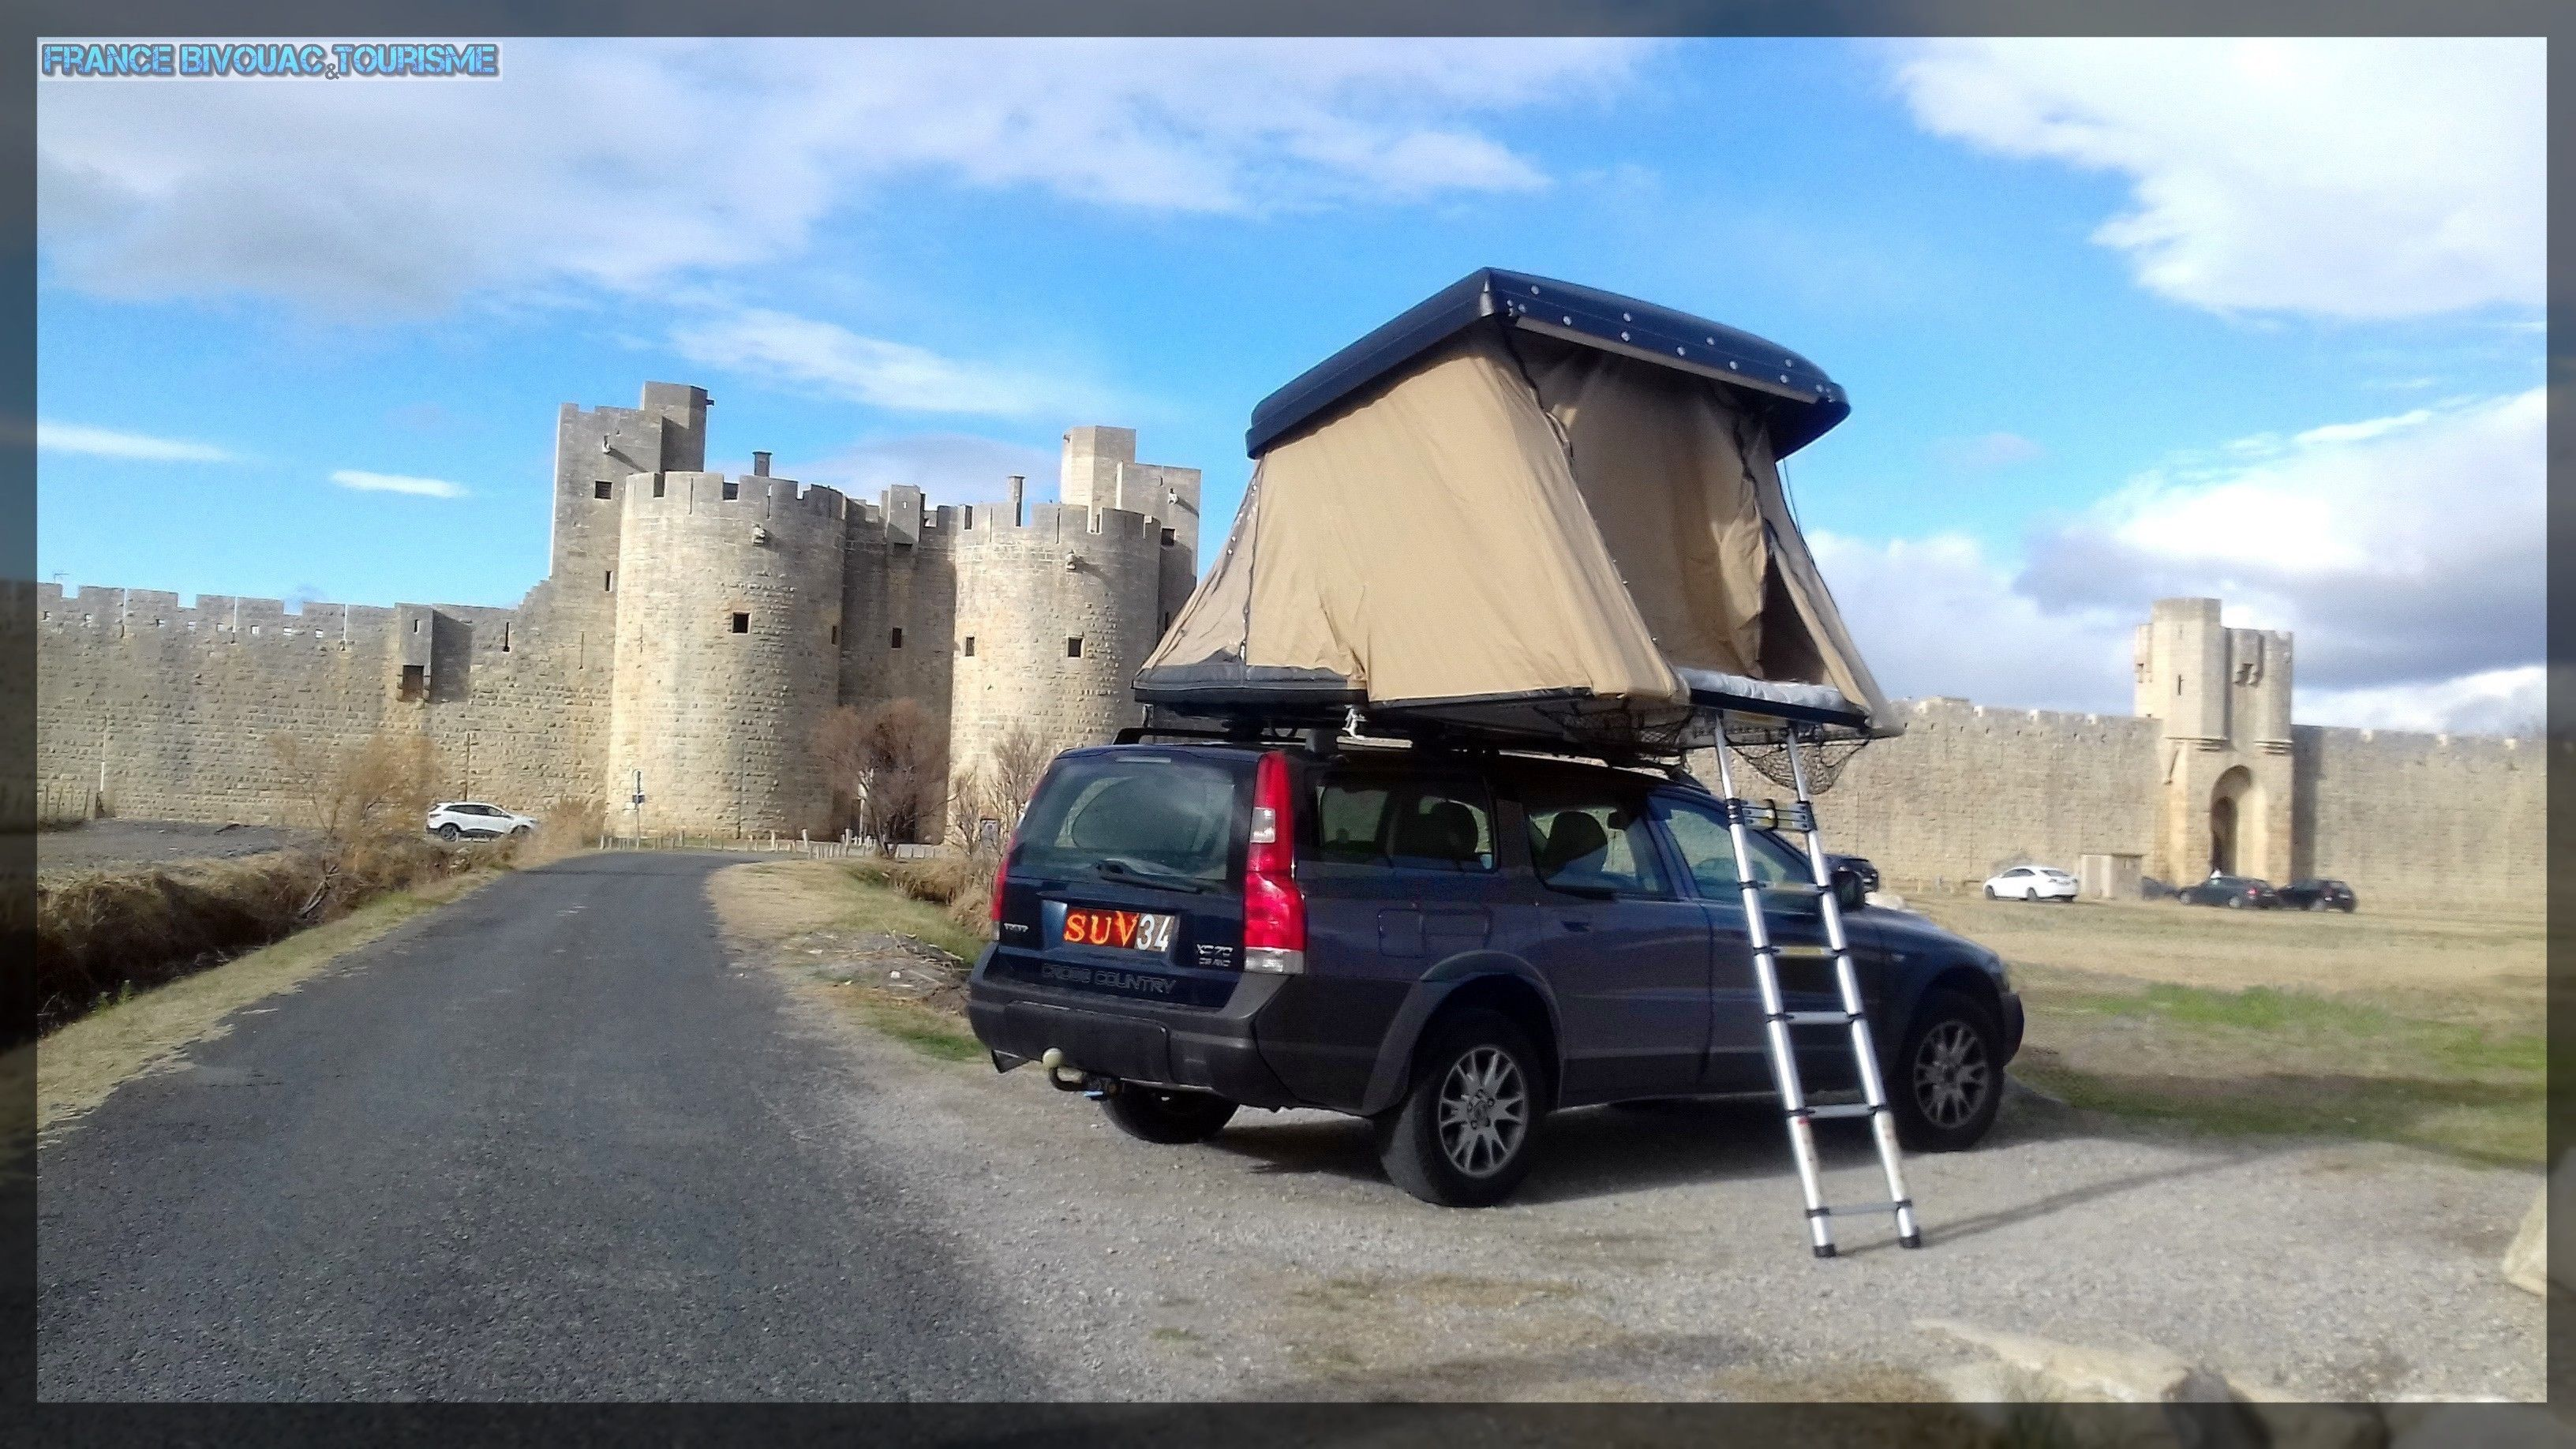 dachzelt hussarde quatro familie f r 4 personen camping. Black Bedroom Furniture Sets. Home Design Ideas